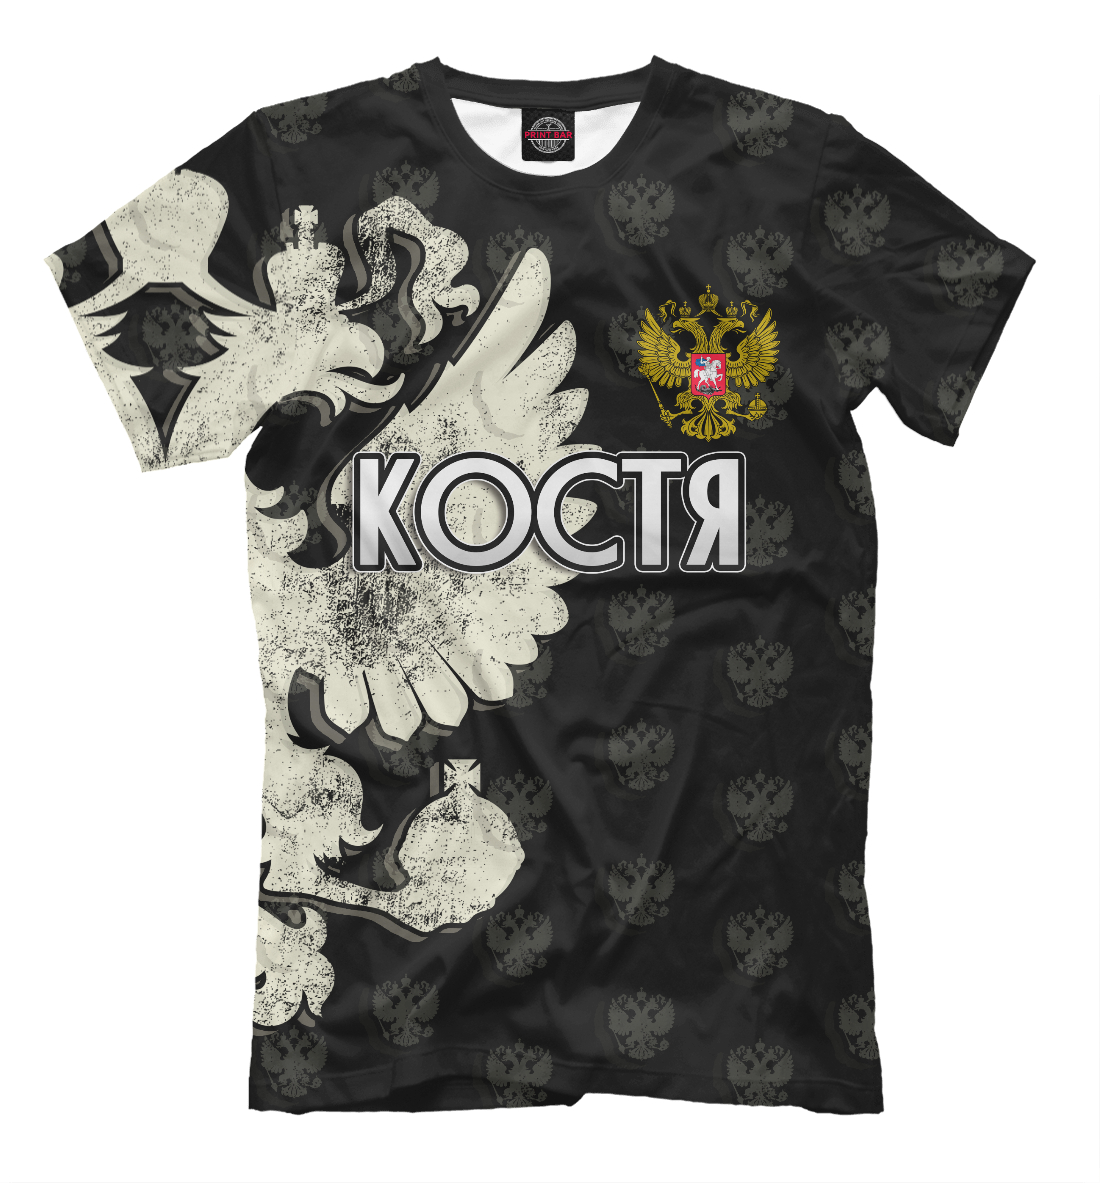 Купить Герб Костя, Printbar, Футболки, KST-232010-fut-2